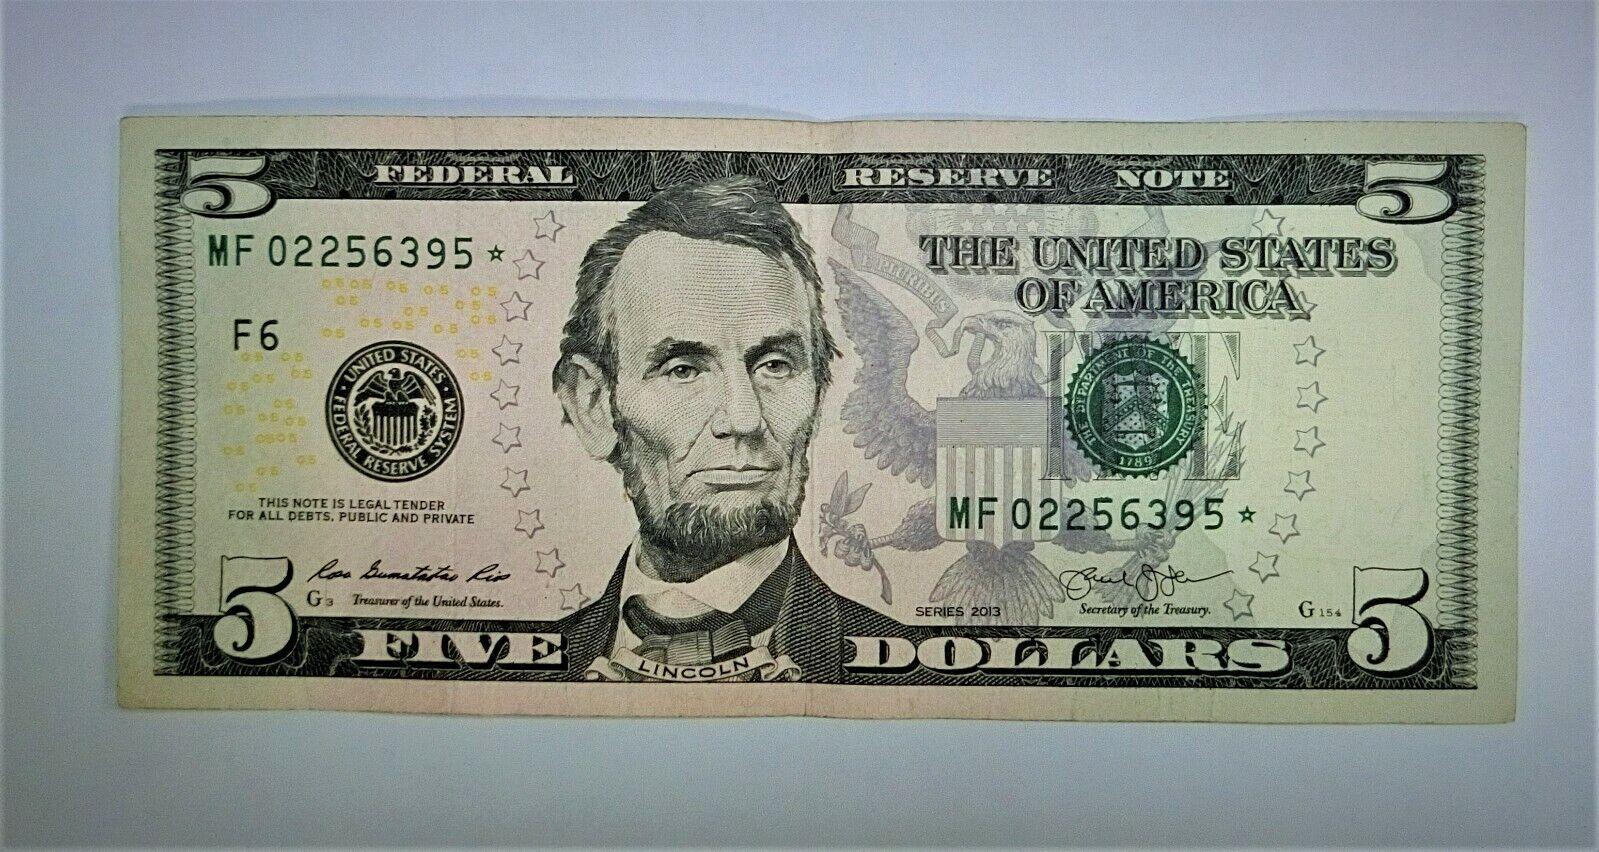 2013 5 FIVE DOLLAR STAR NOTE CURRENCY, BILL MF - 124  - $1.84